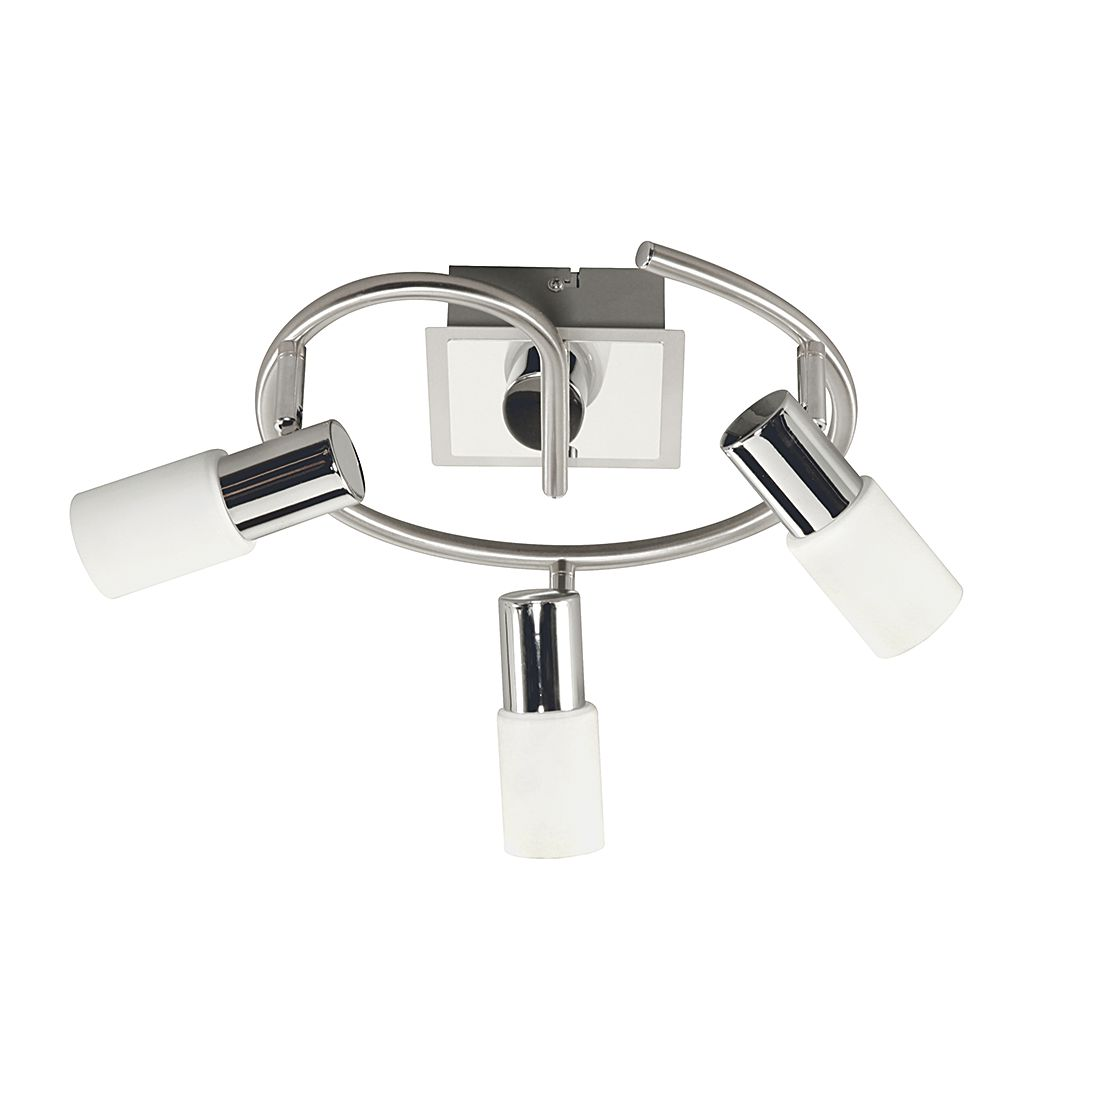 EEK A+, Deckenspirale BAS – Metall/Glas – 3-flammig, Action online kaufen